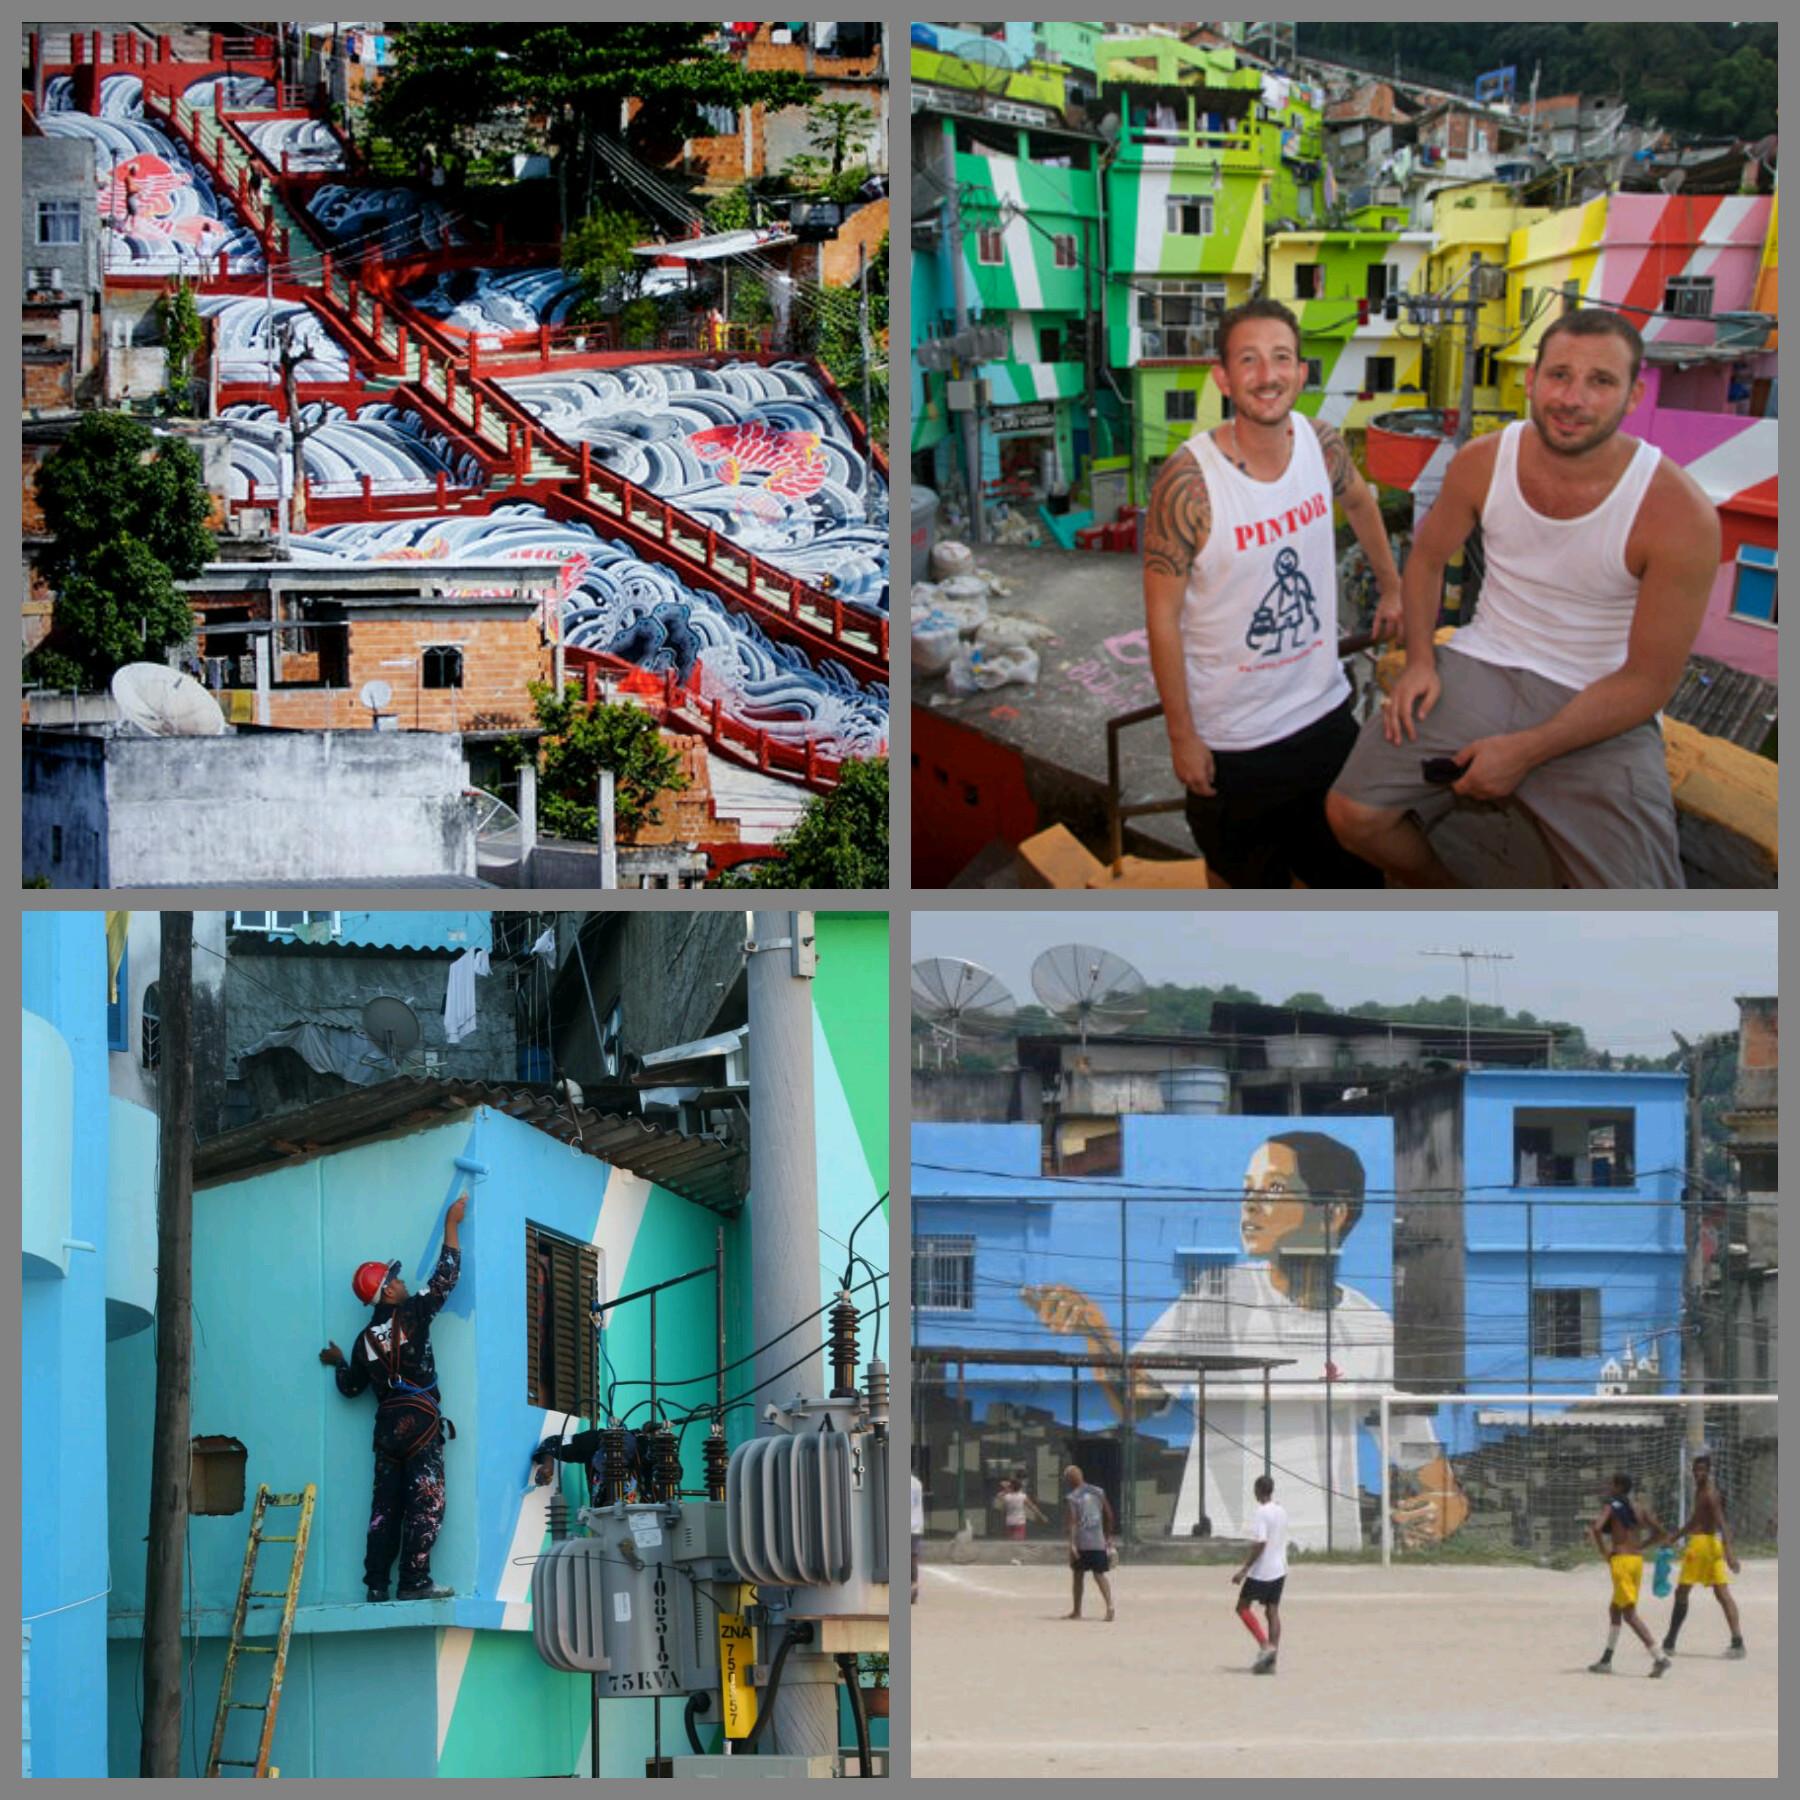 http://www.modernehippies.nl/wp-content/uploads/2013/04/favela.jpg